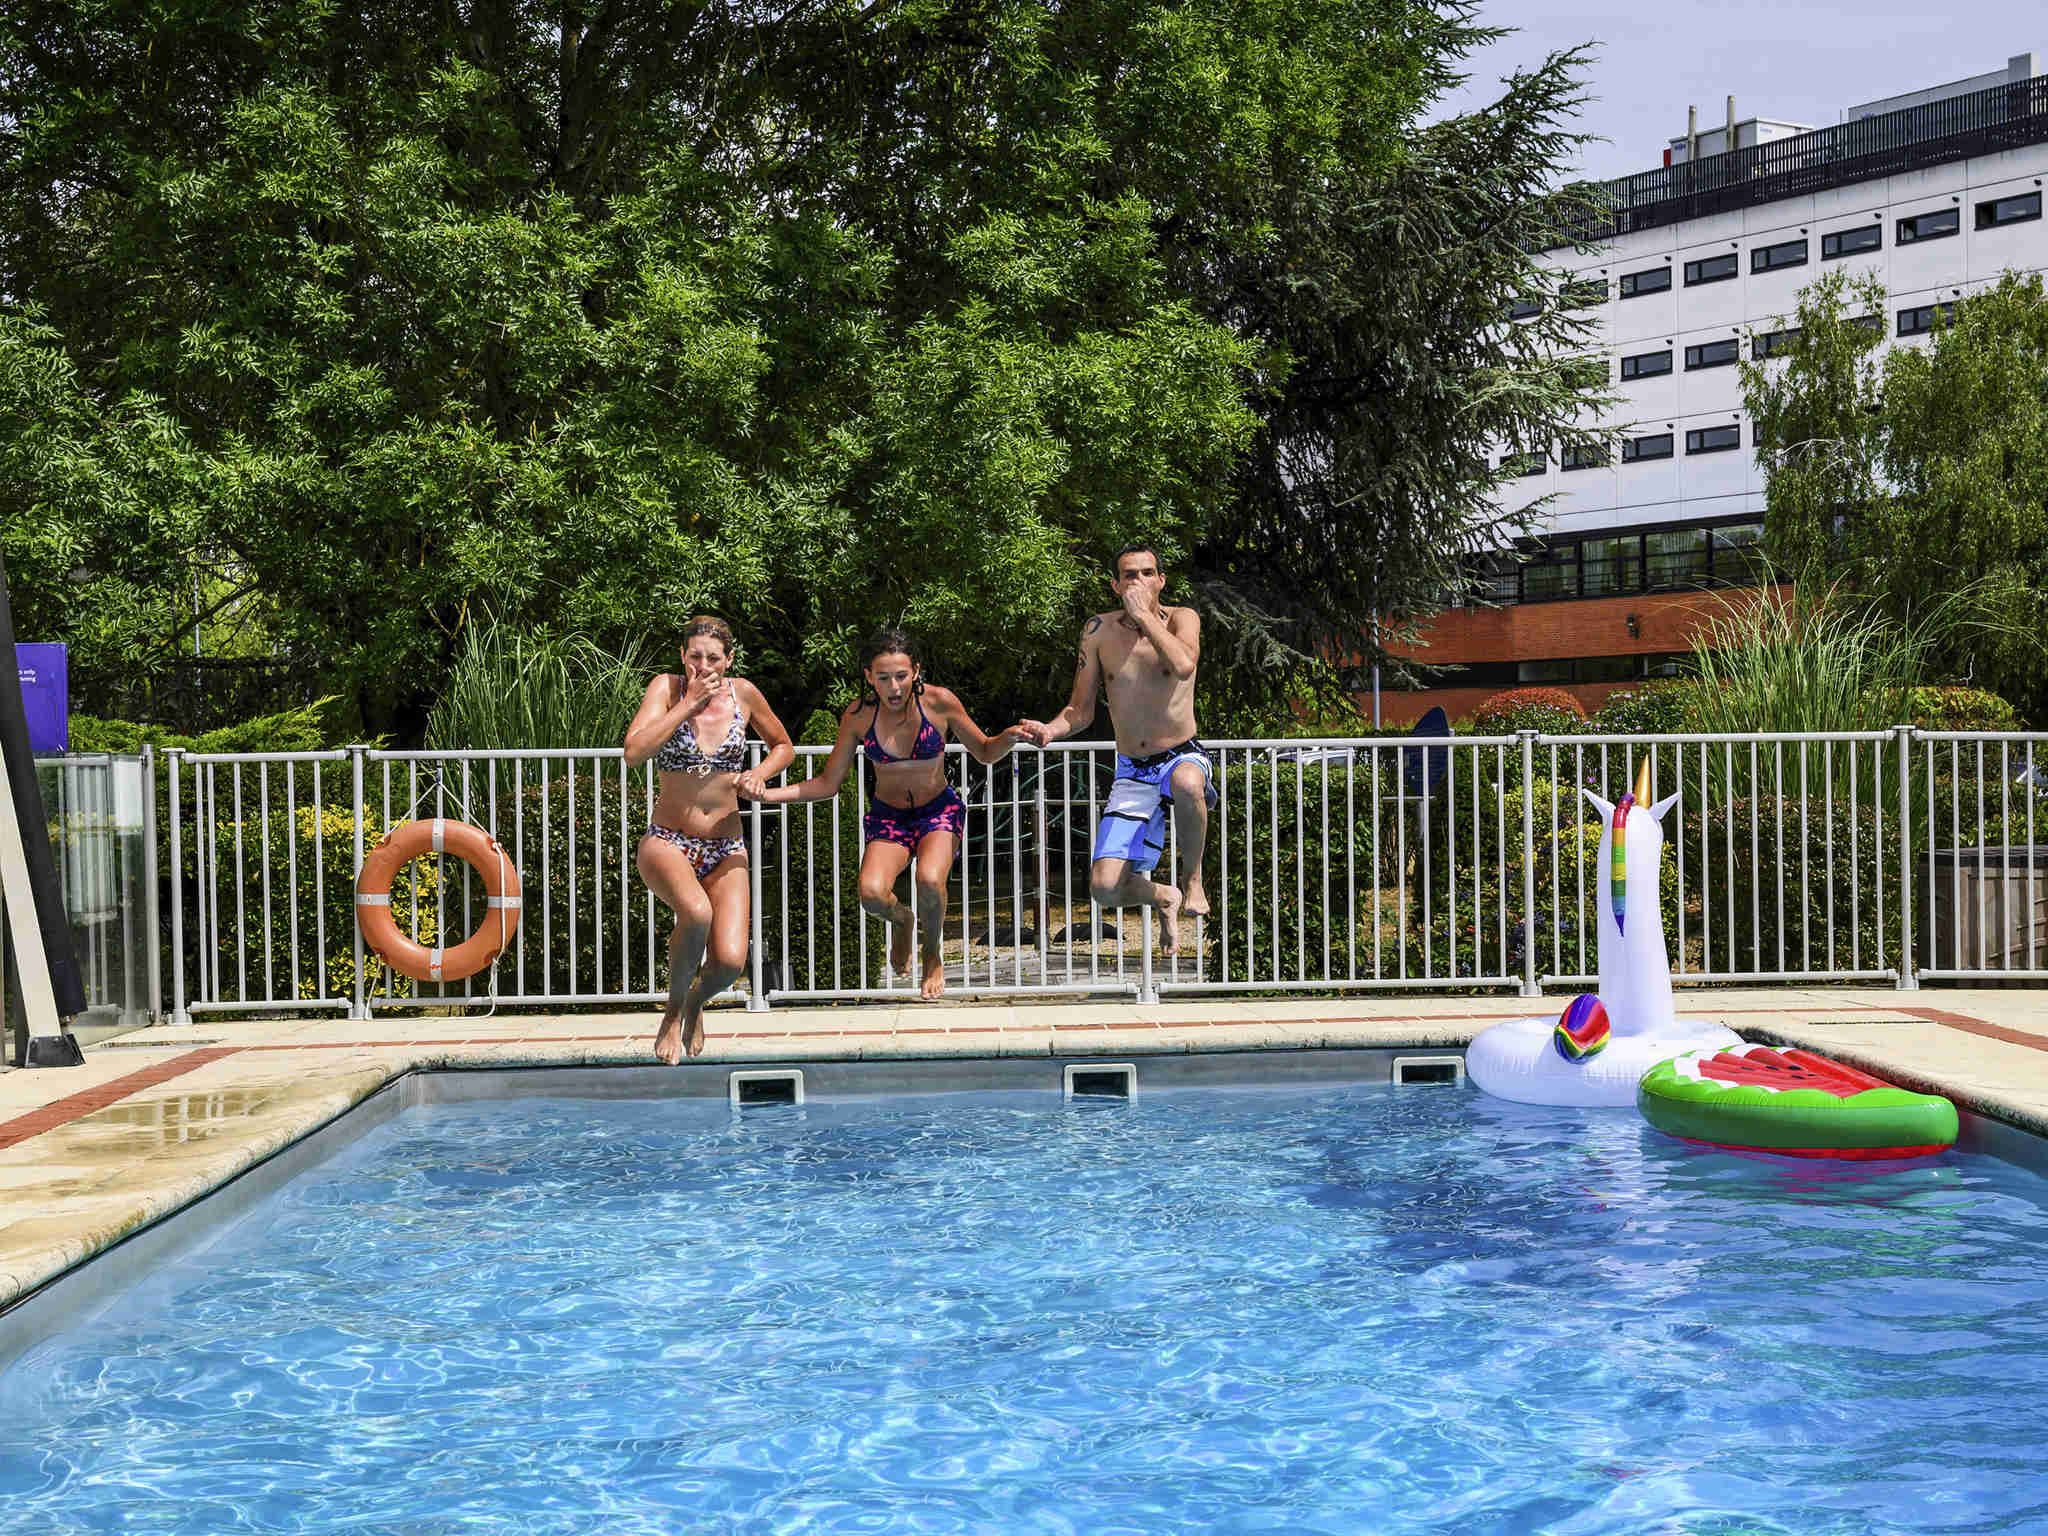 Hotel - Novotel Évry Courcouronnes